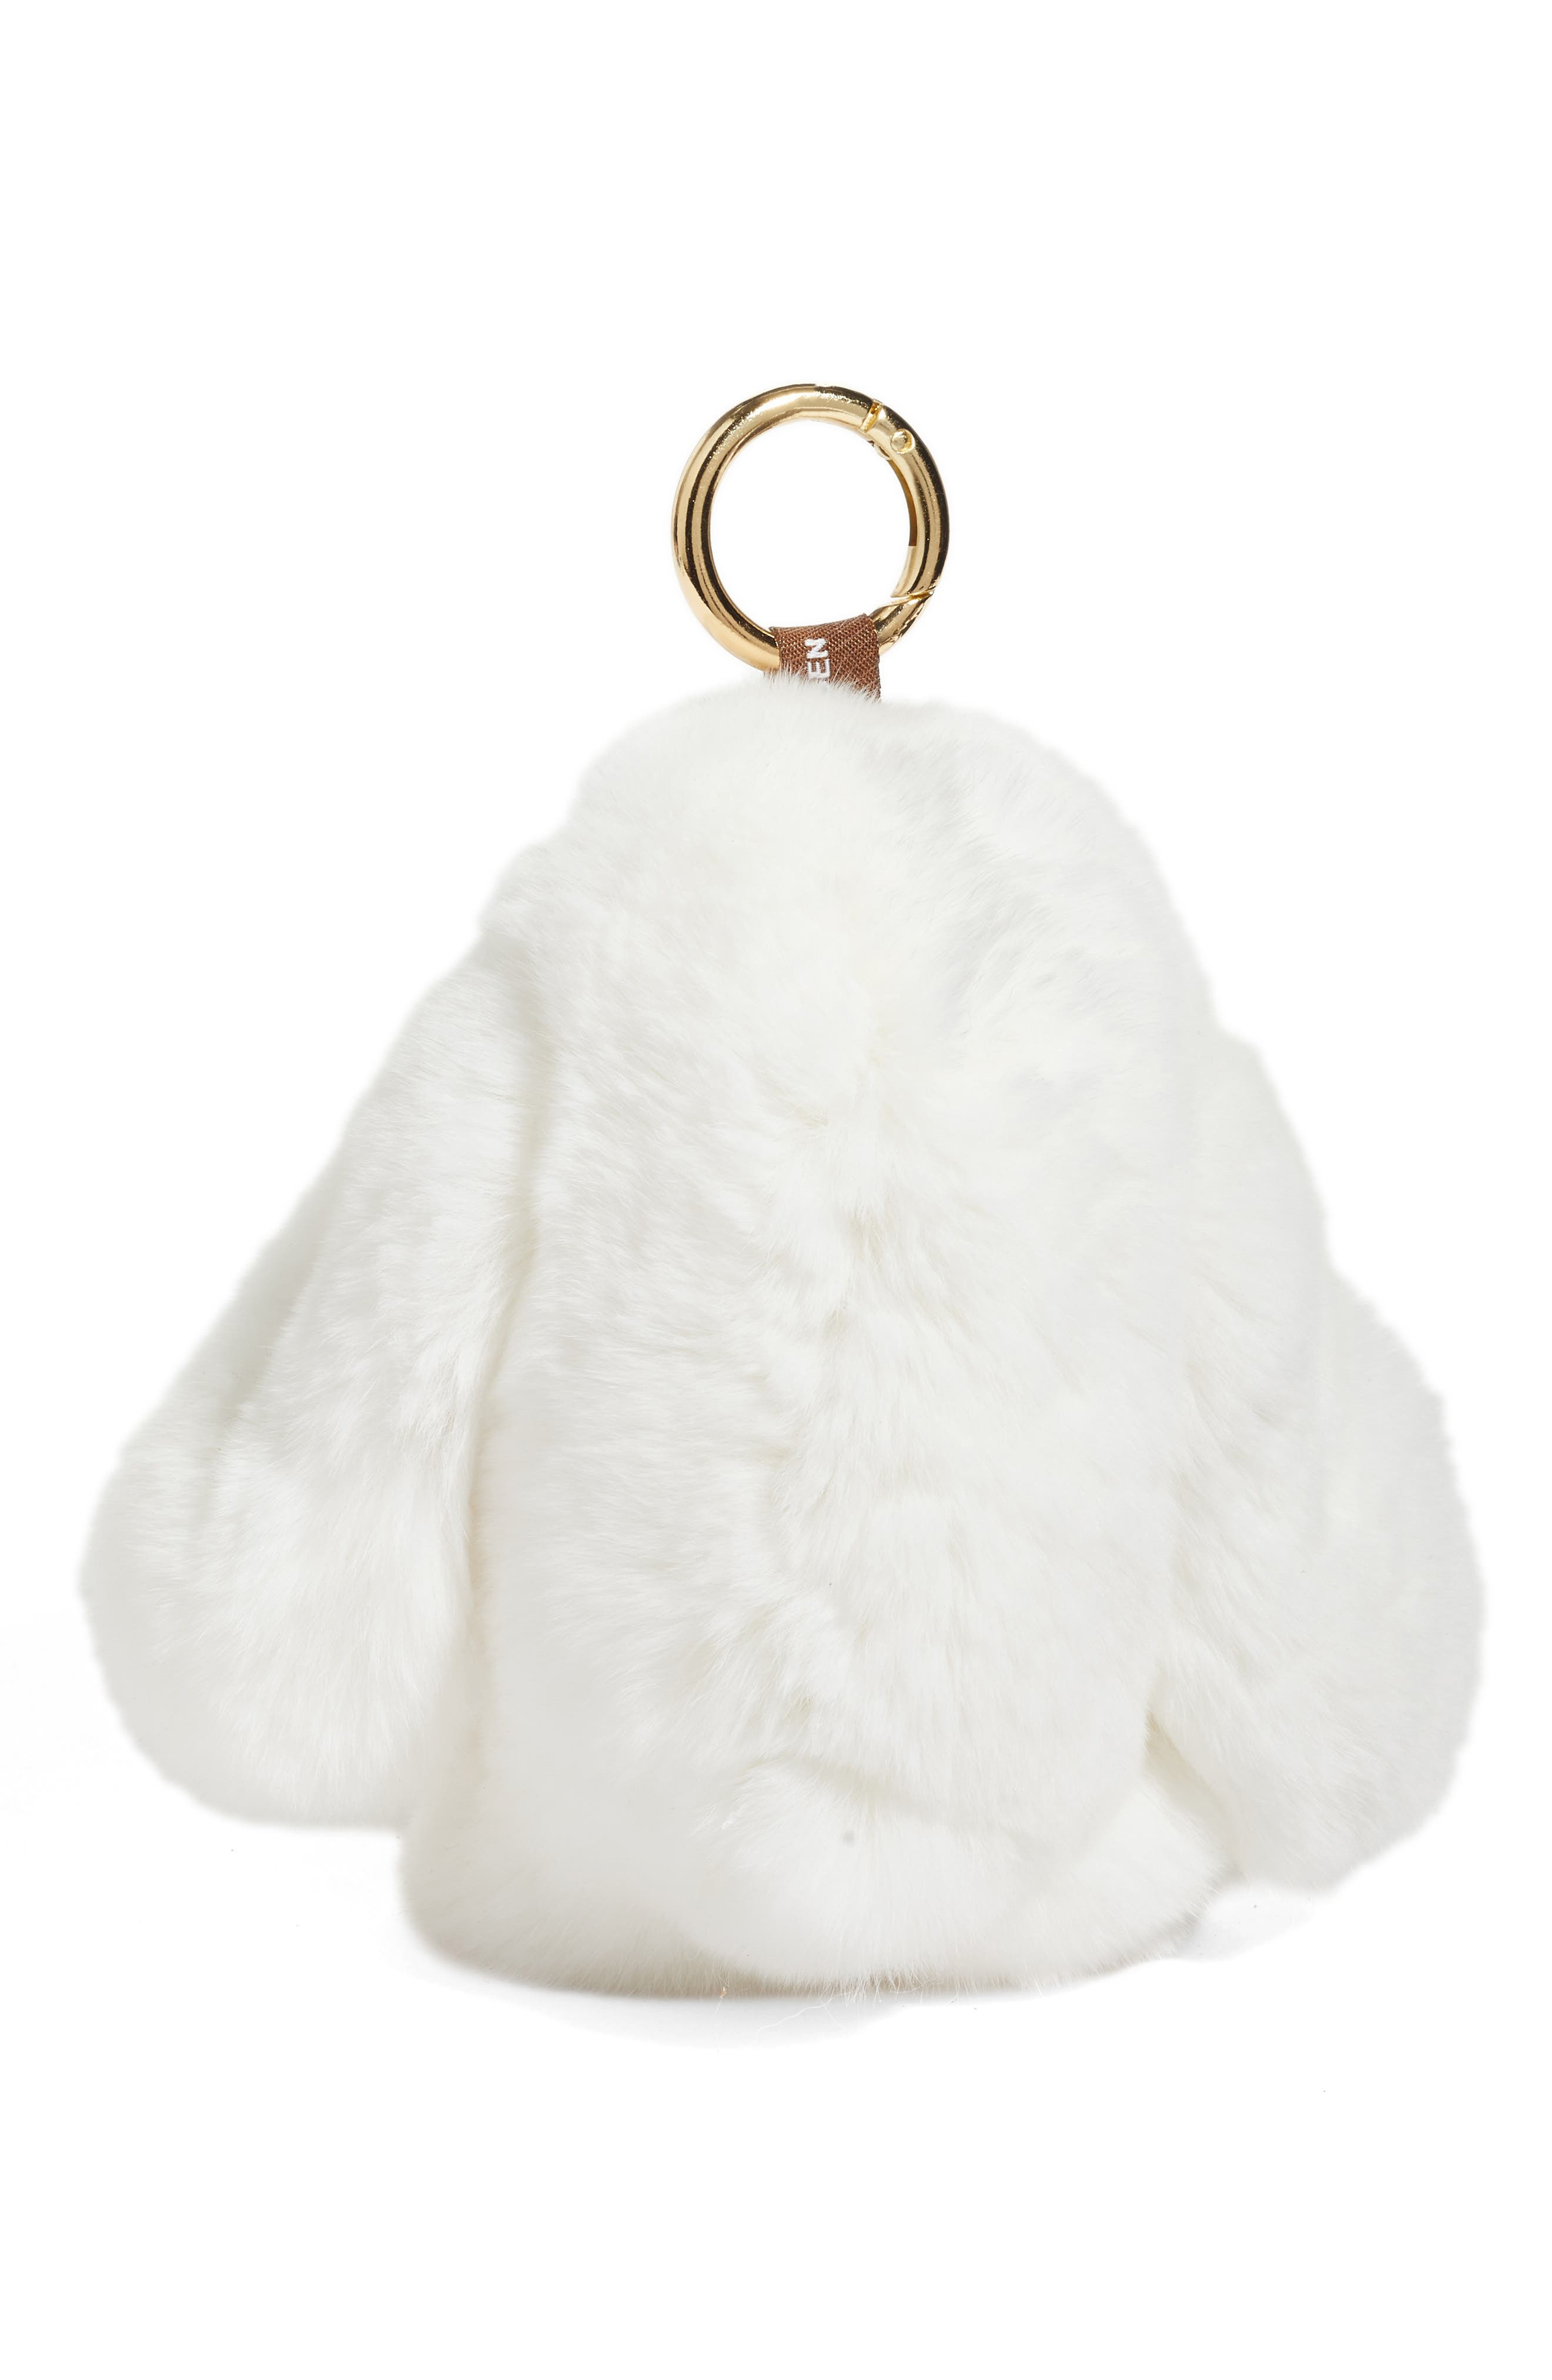 Natasha Couture Genuine Rabbit Fur Bag Charm,                             Alternate thumbnail 2, color,                             White